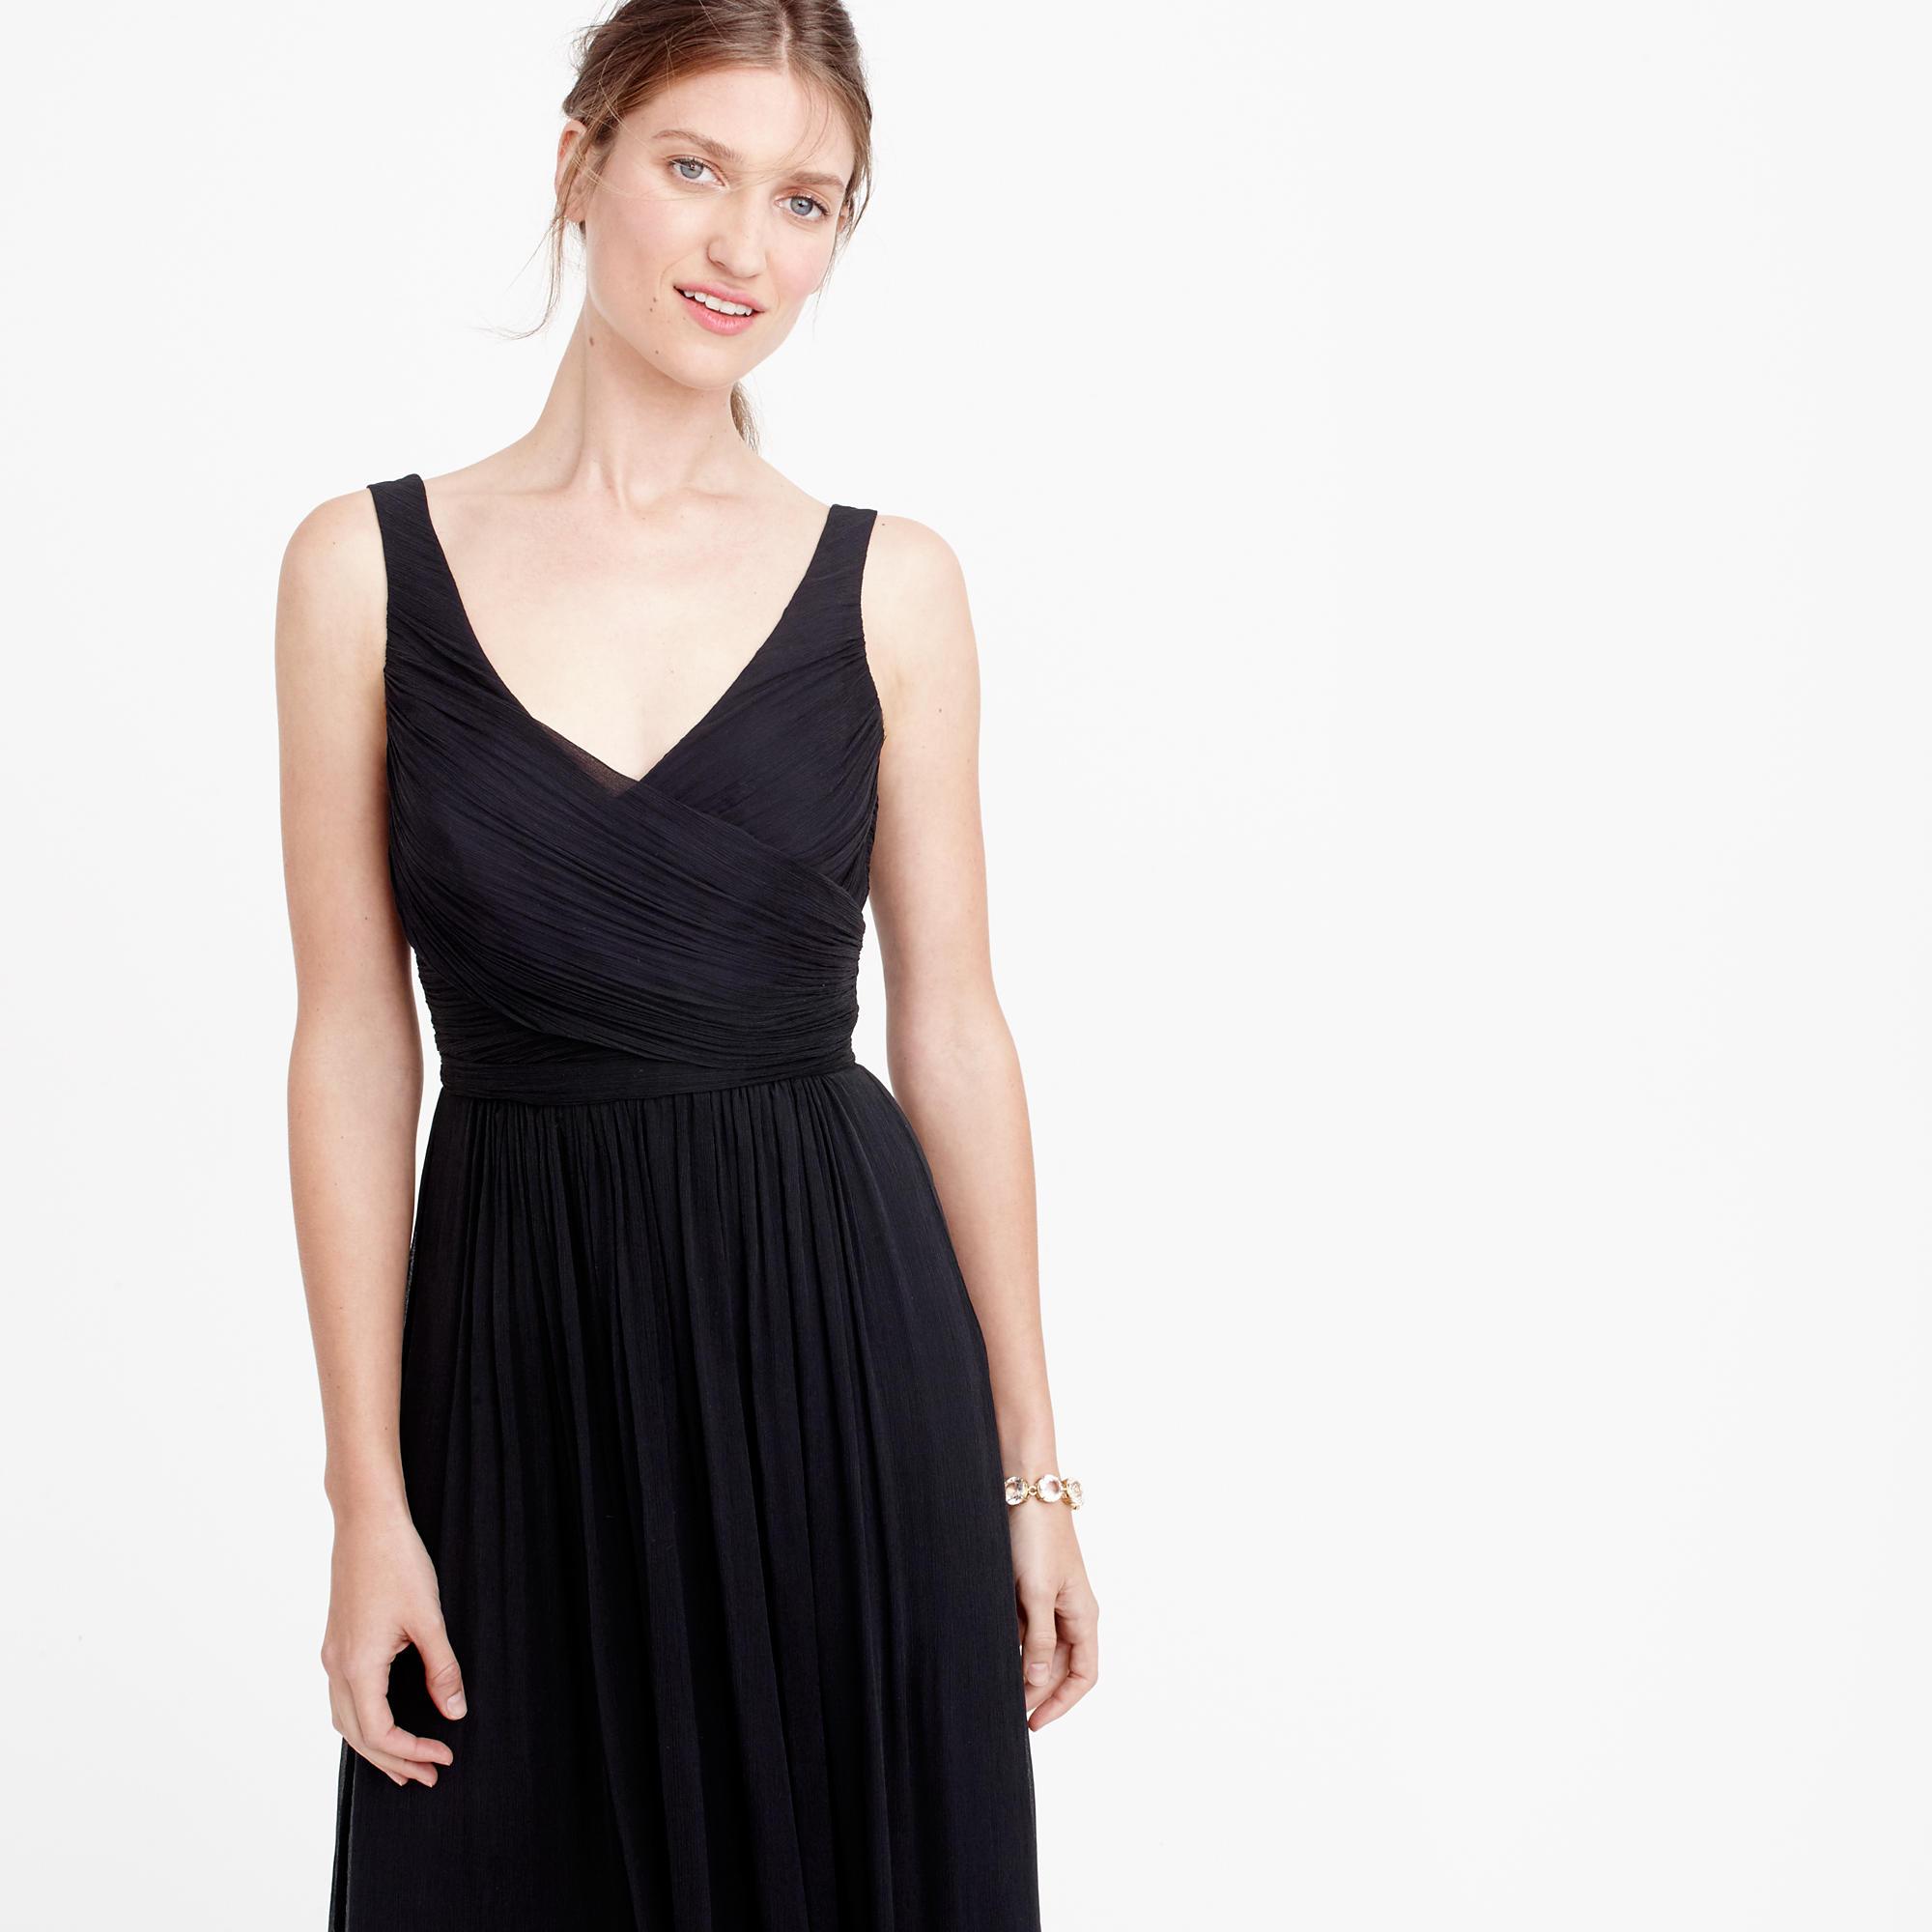 Heidi long dress in silk chiffon : Wedding sizes 16 to 20  J.Crew